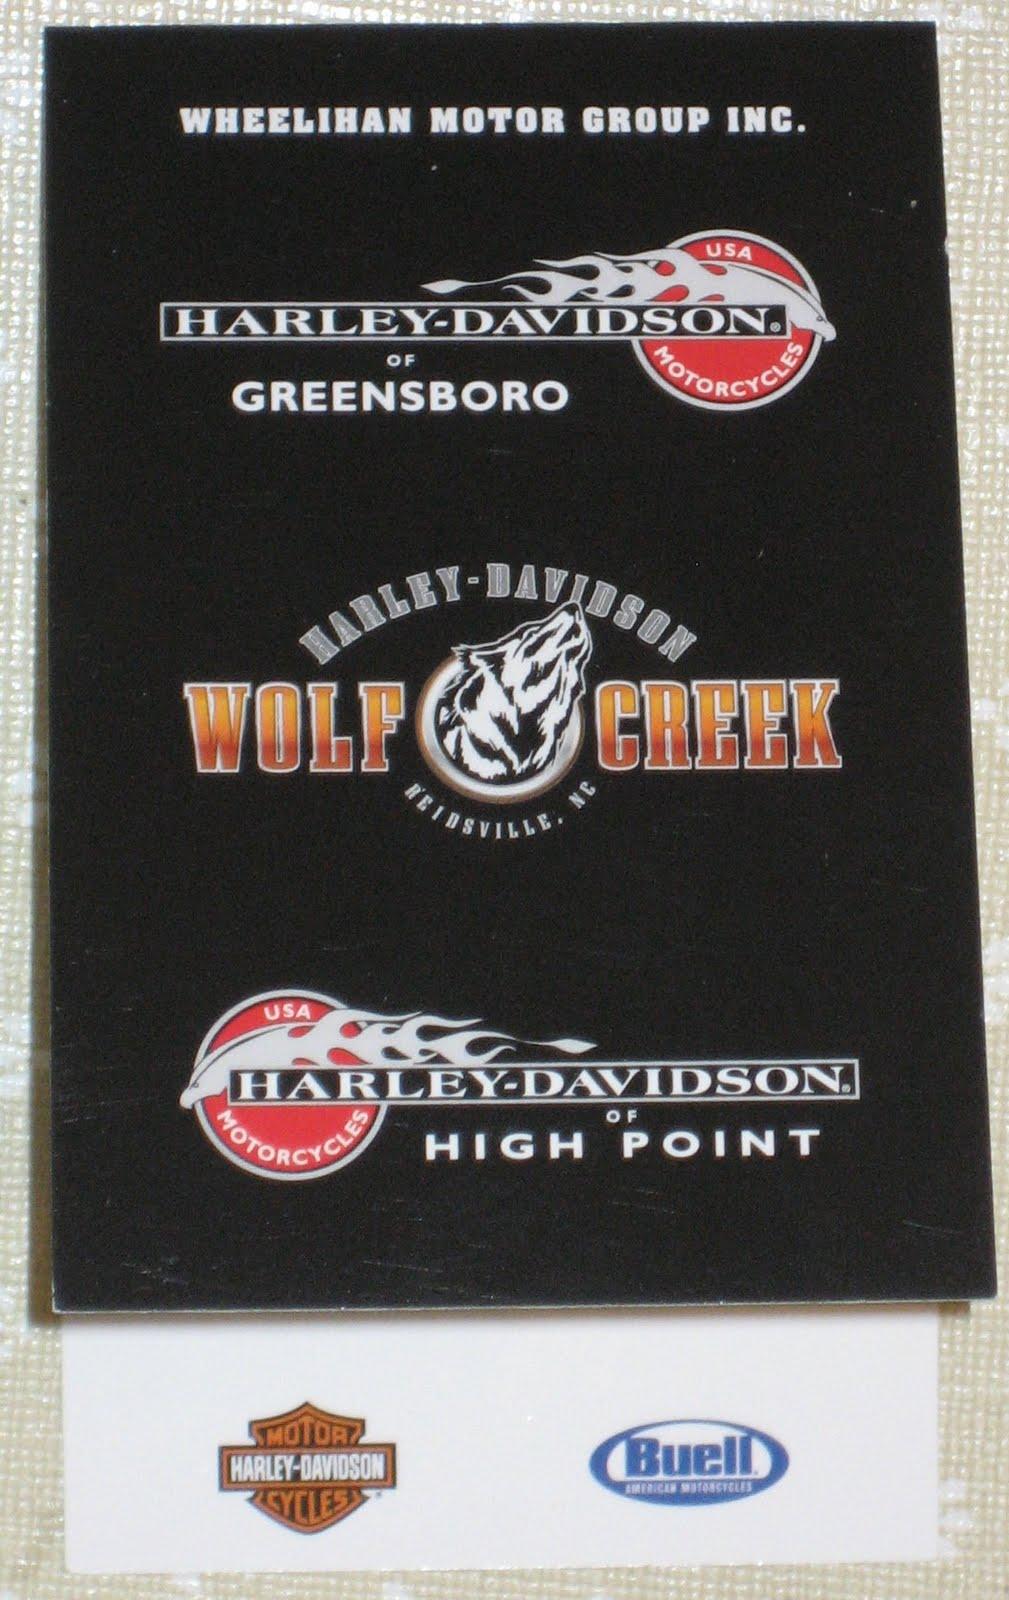 My Harley Cards: June 2010